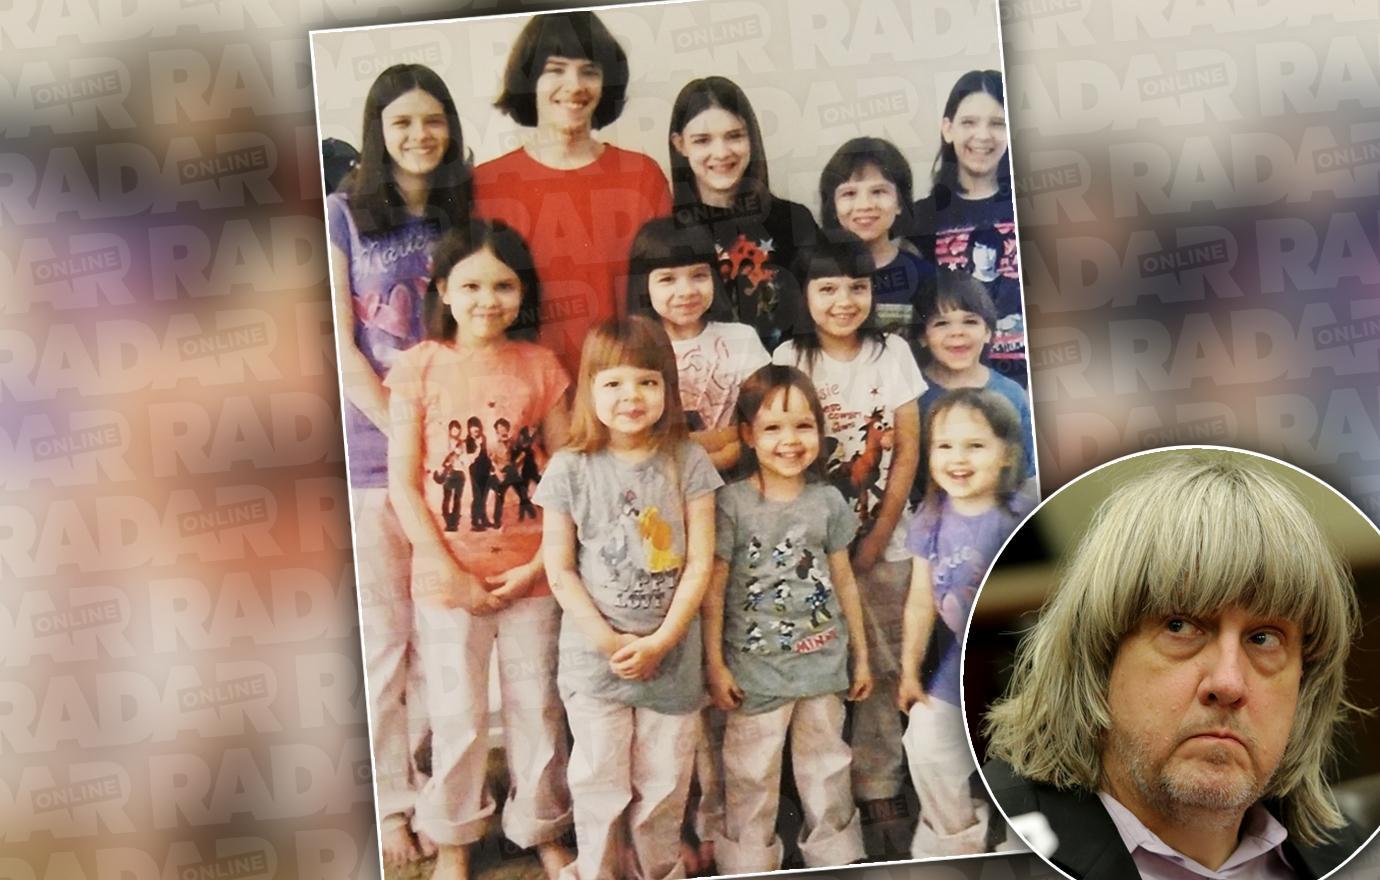 david turpin jailhouse interview monster dad begs kids forgiveness